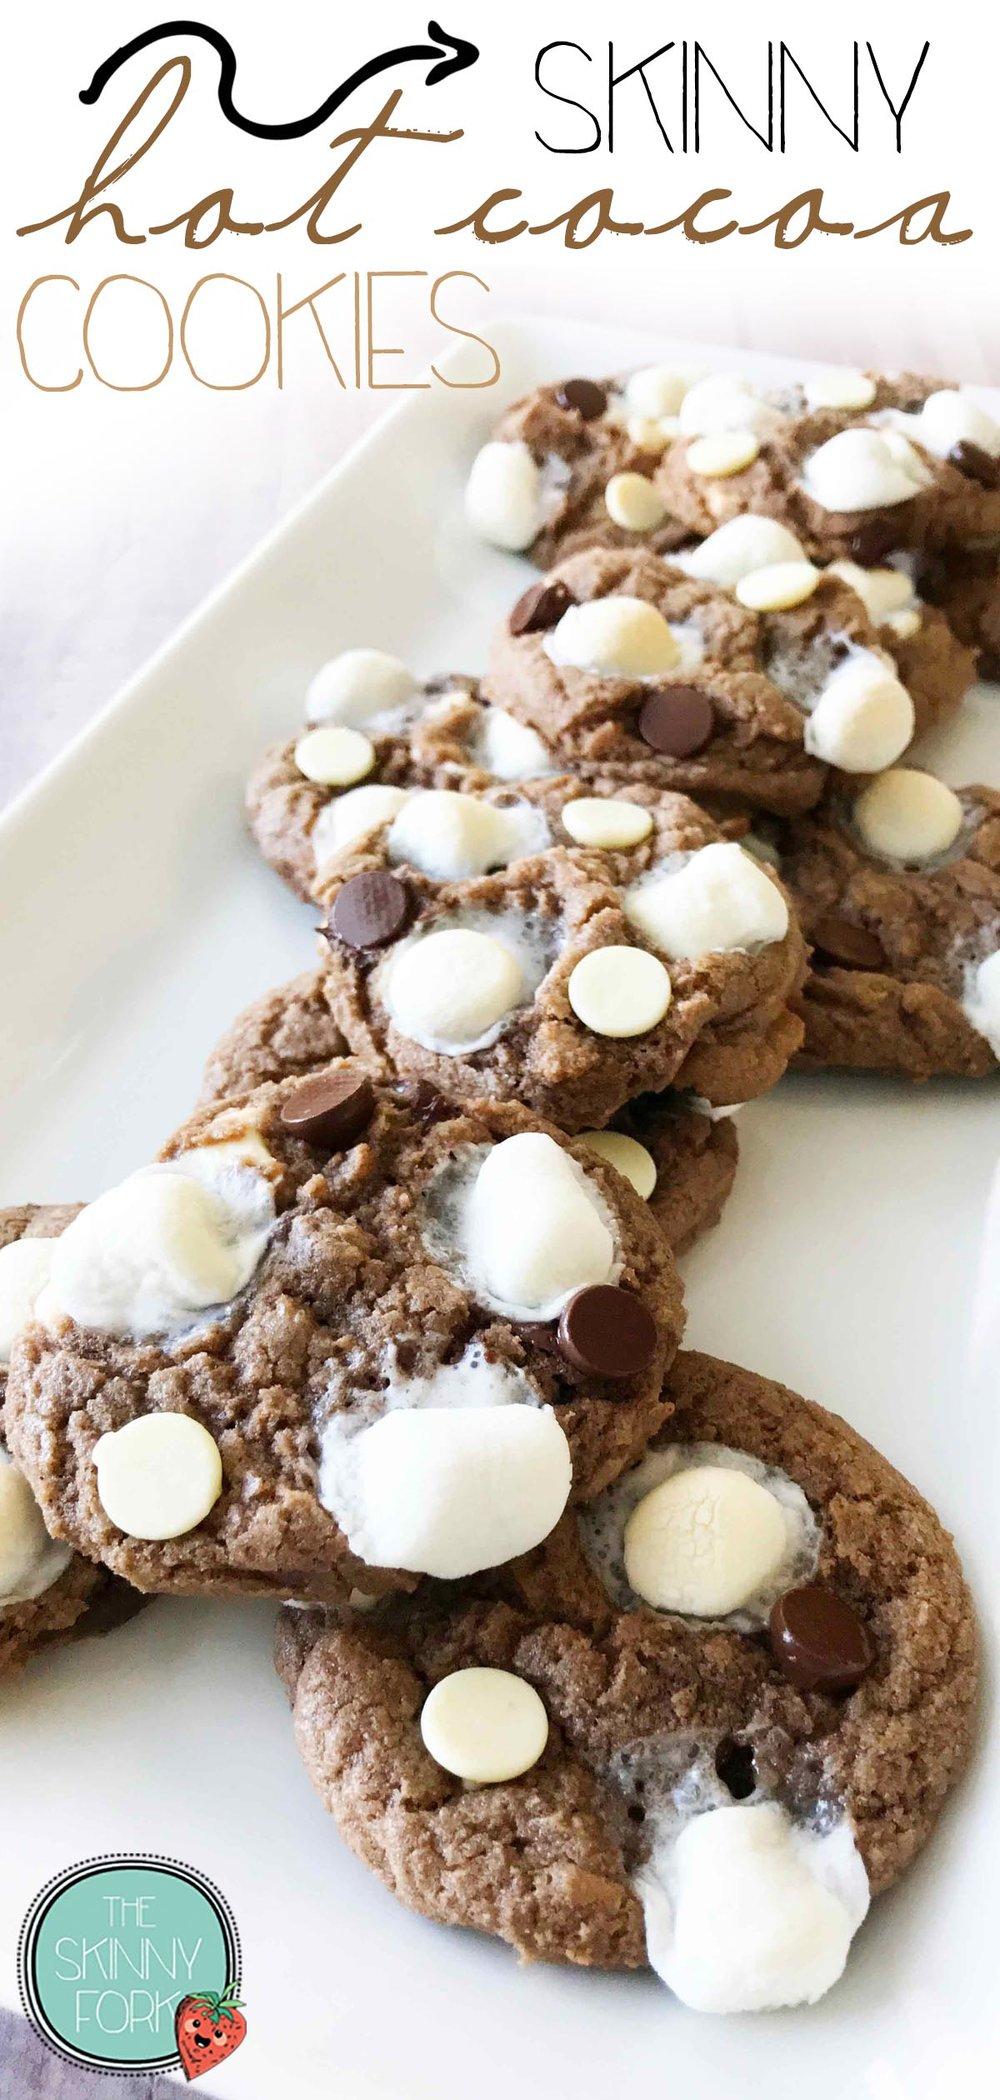 cocoa-cookies-pin.jpg